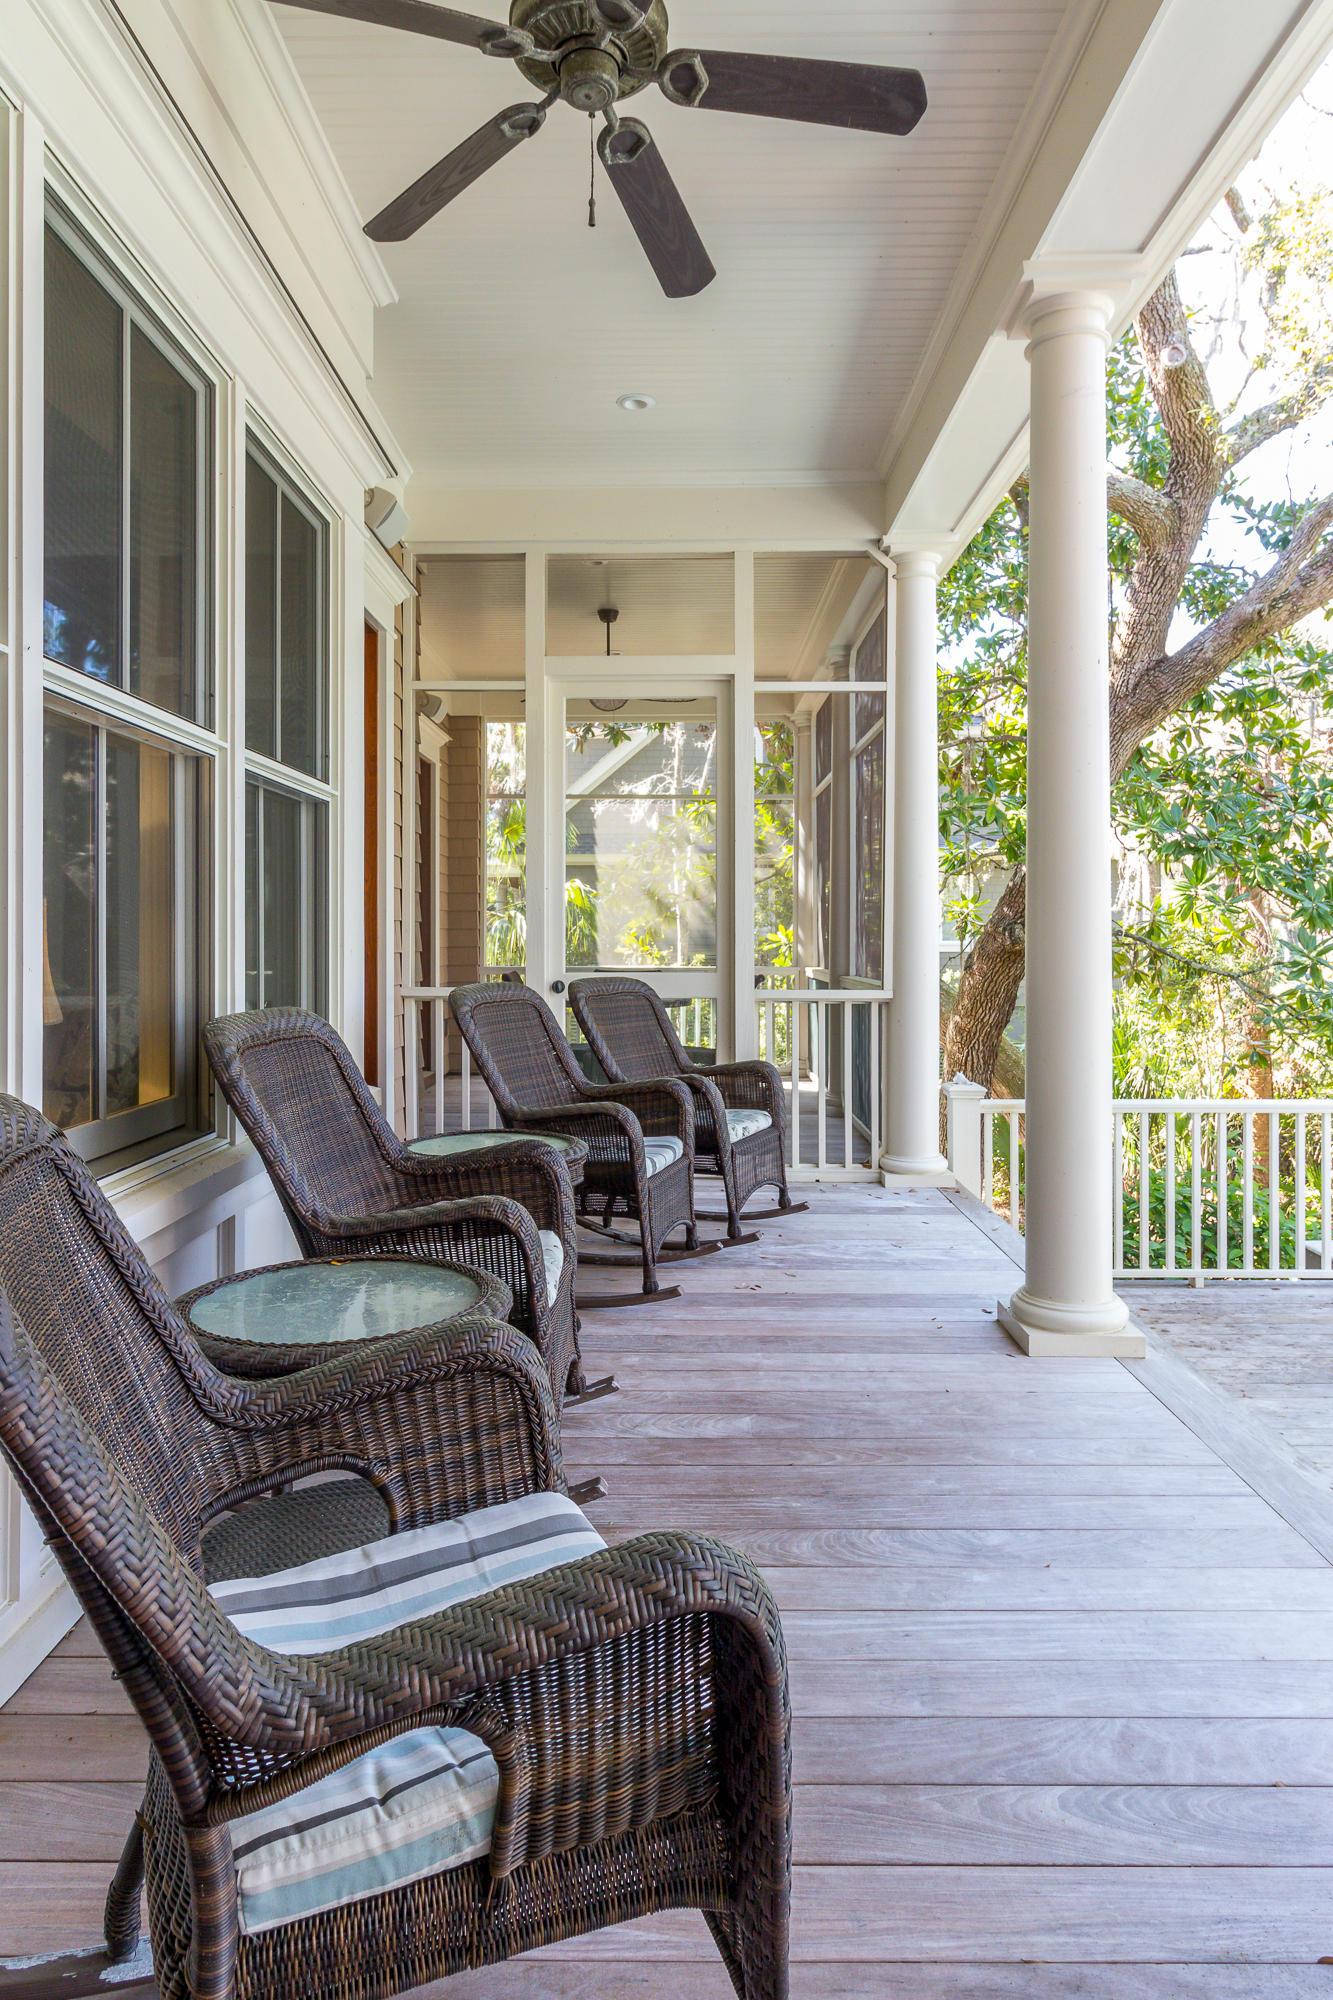 Egret/Pintail Homes For Sale - 117 Bufflehead, Kiawah Island, SC - 8